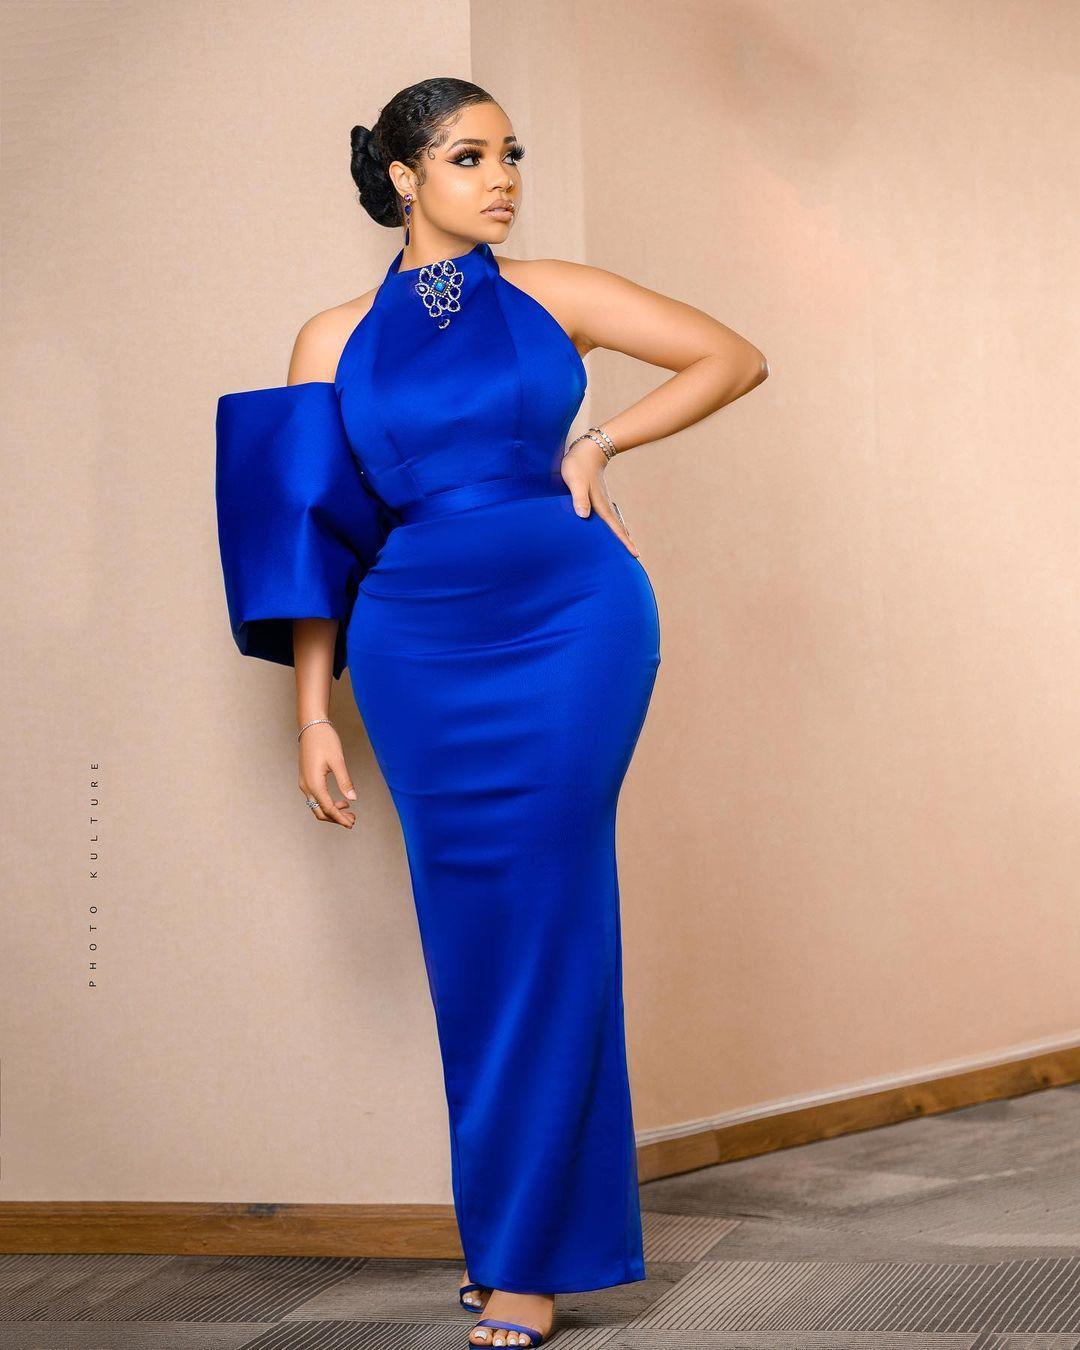 aesthetic black women fashion